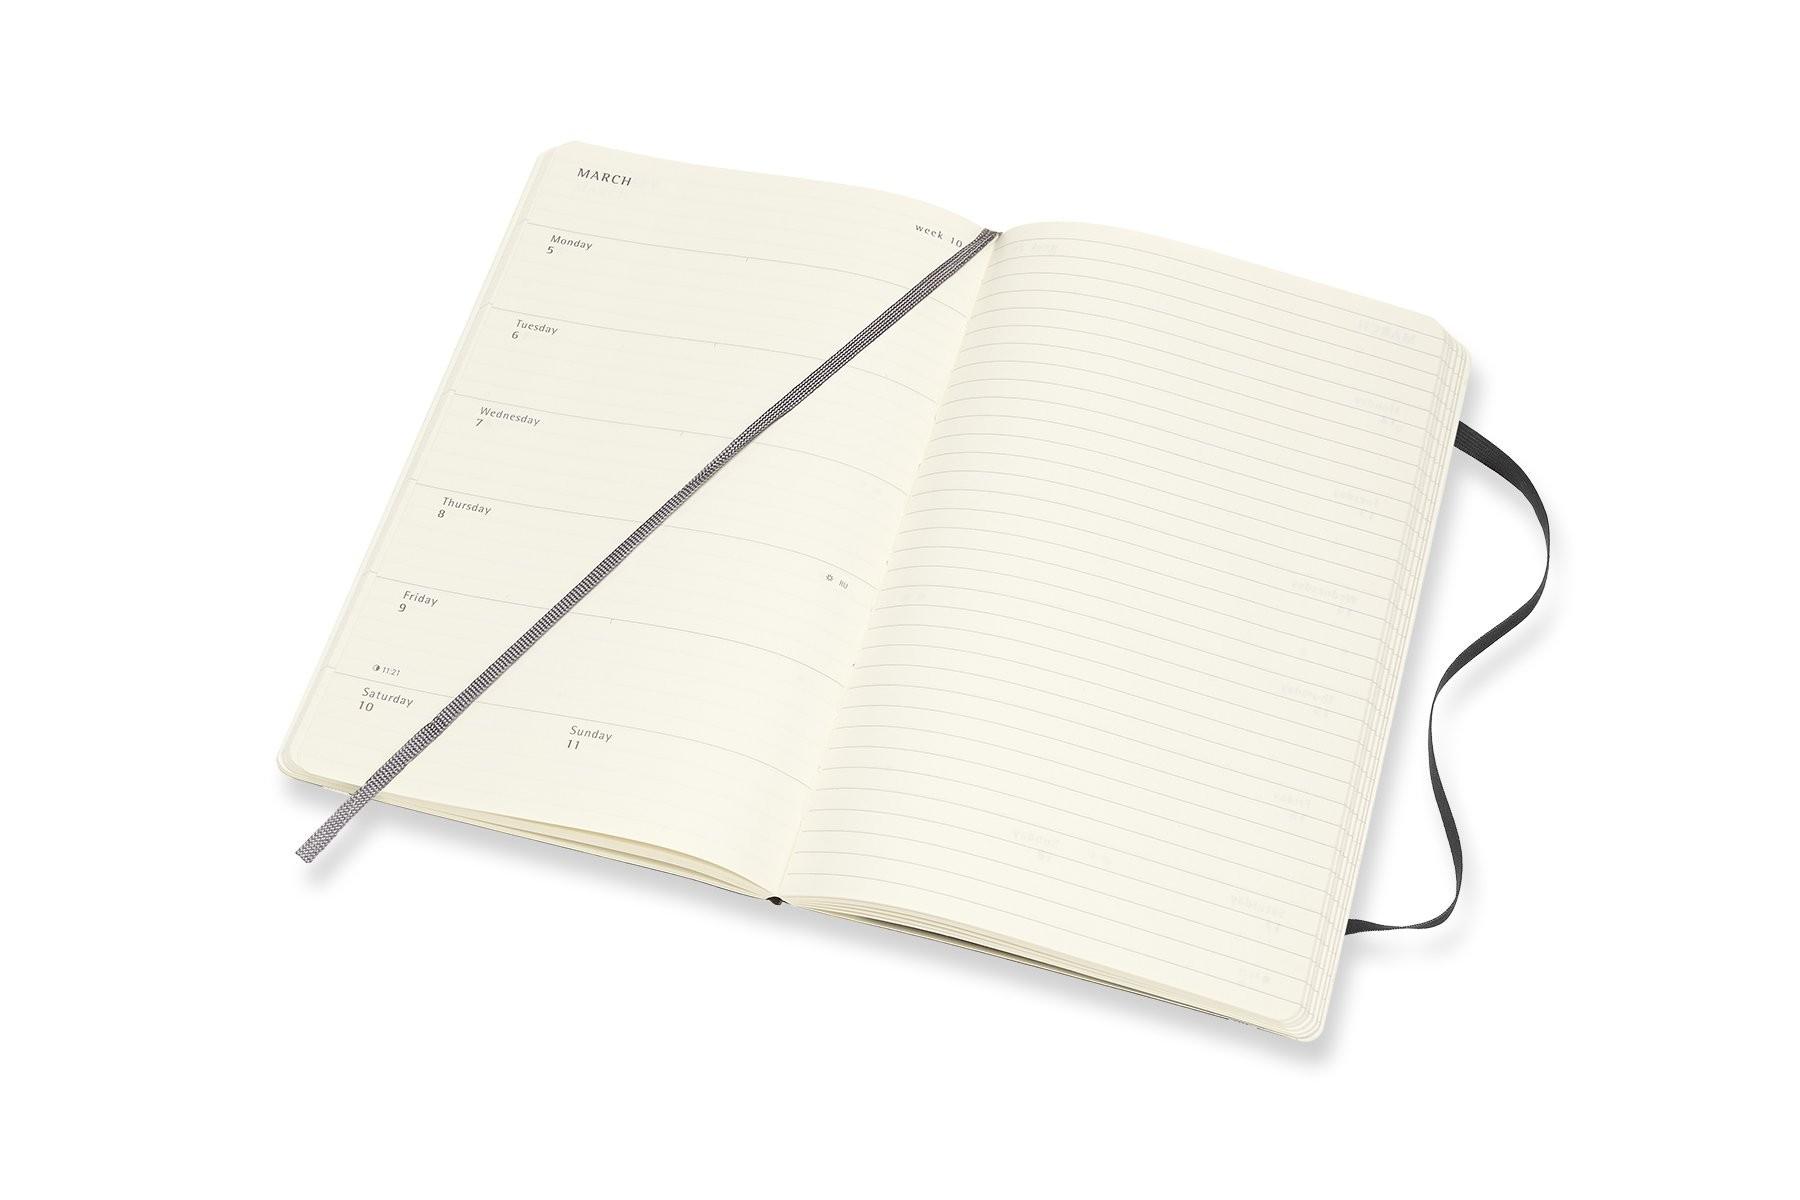 Moleskine 18 Month Weekly Planner Black Soft Cover 5 x 8 25 Amazon Moleskine Books